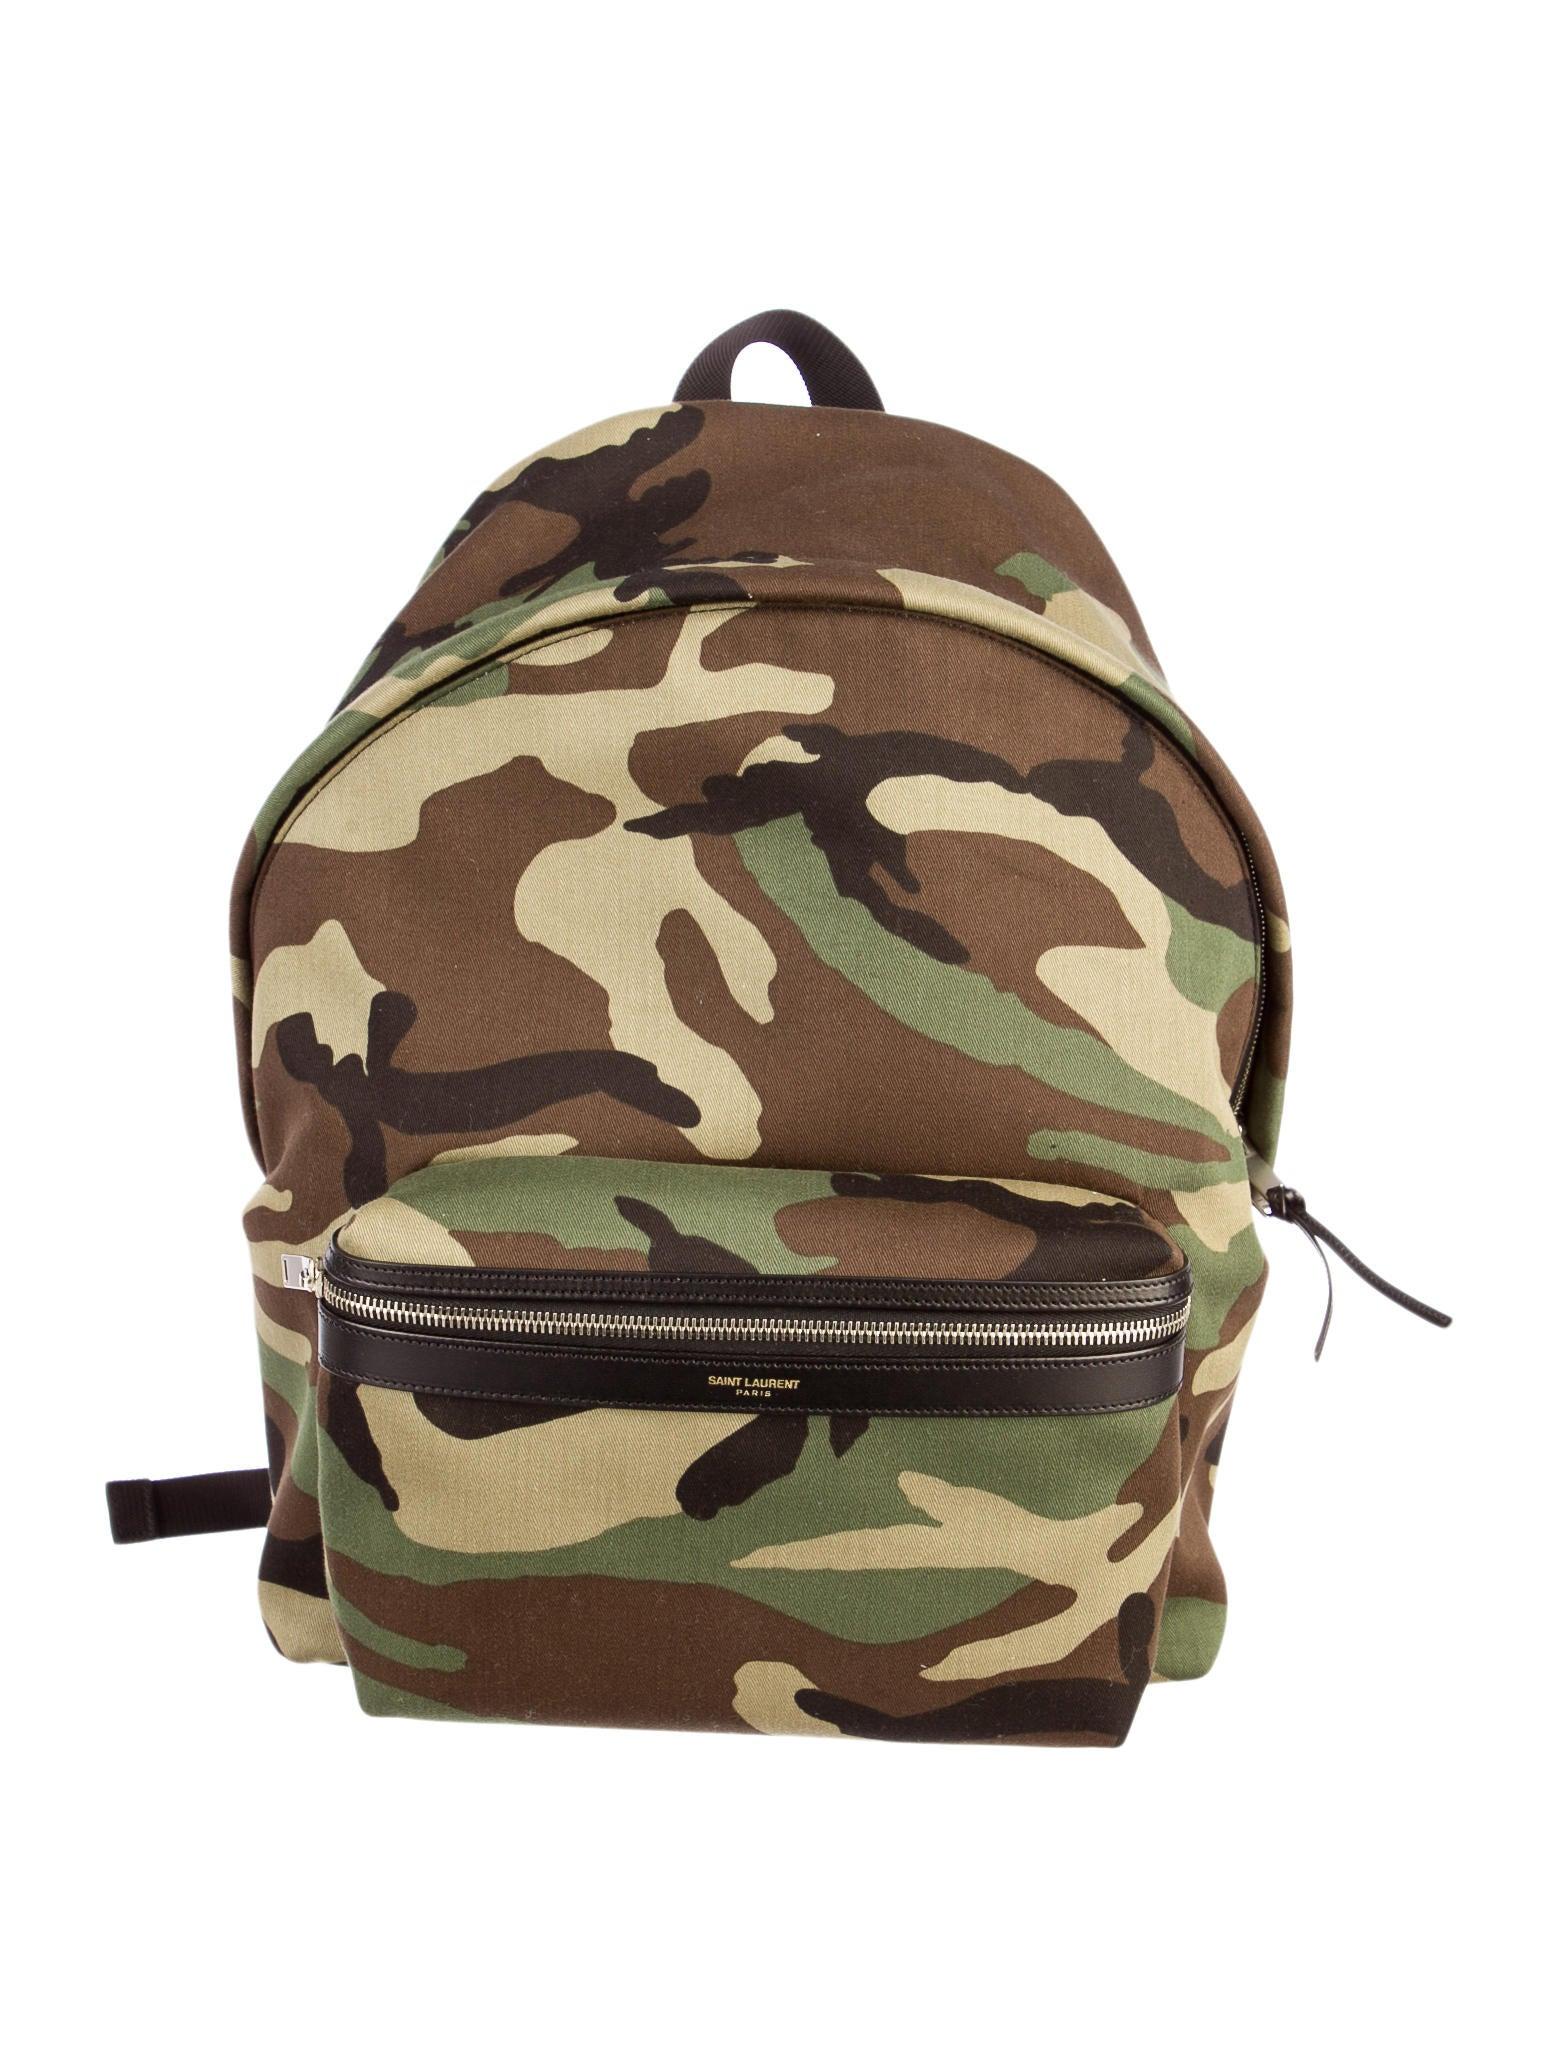 7ac96e3d7f8 Saint Laurent Camo Backpack w Tags - Bags - SNT20585